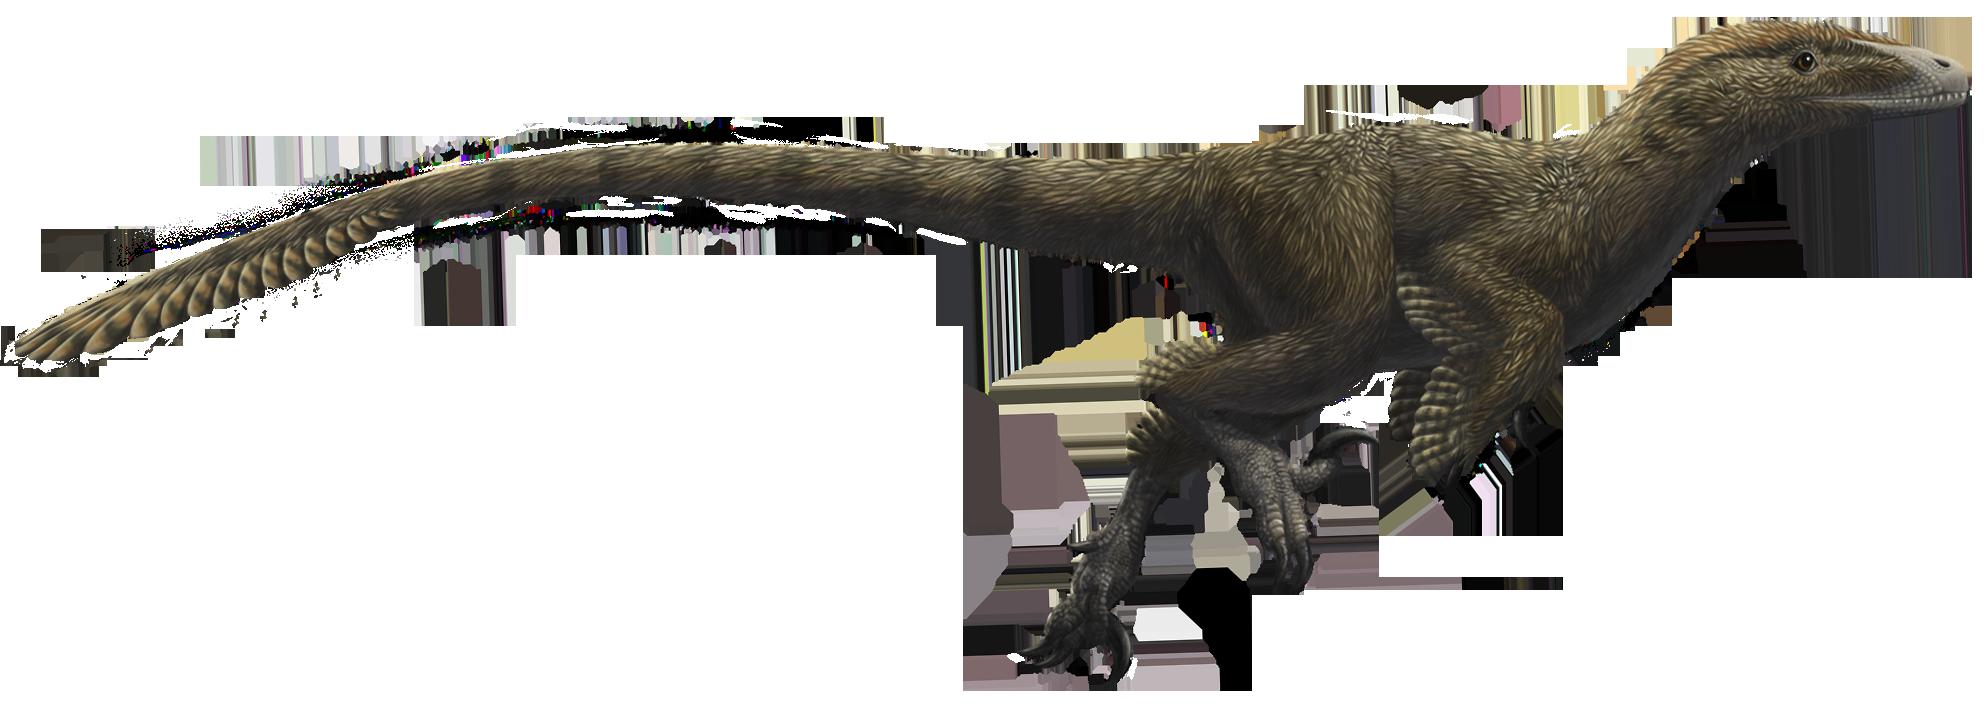 fileutahraptor ostrommaysorum flippedpng wikimedia